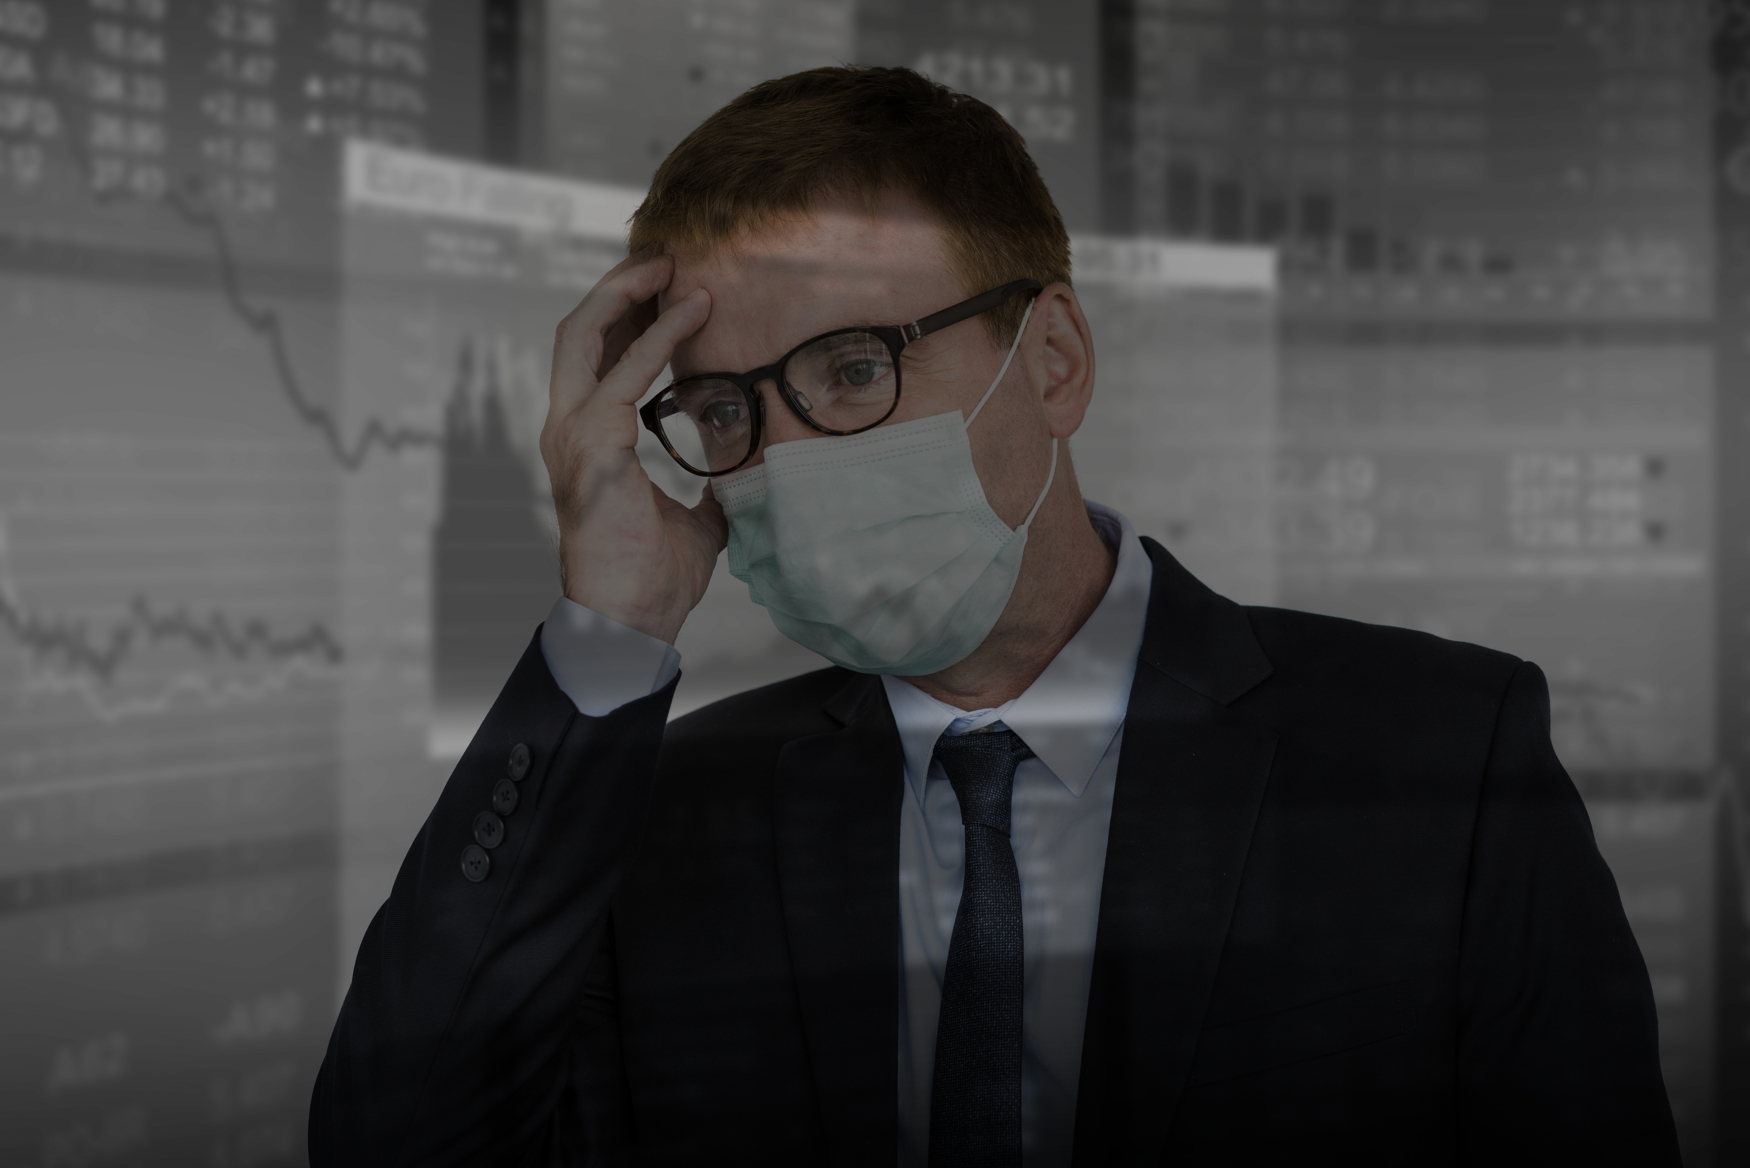 Stock Market and COVID-19